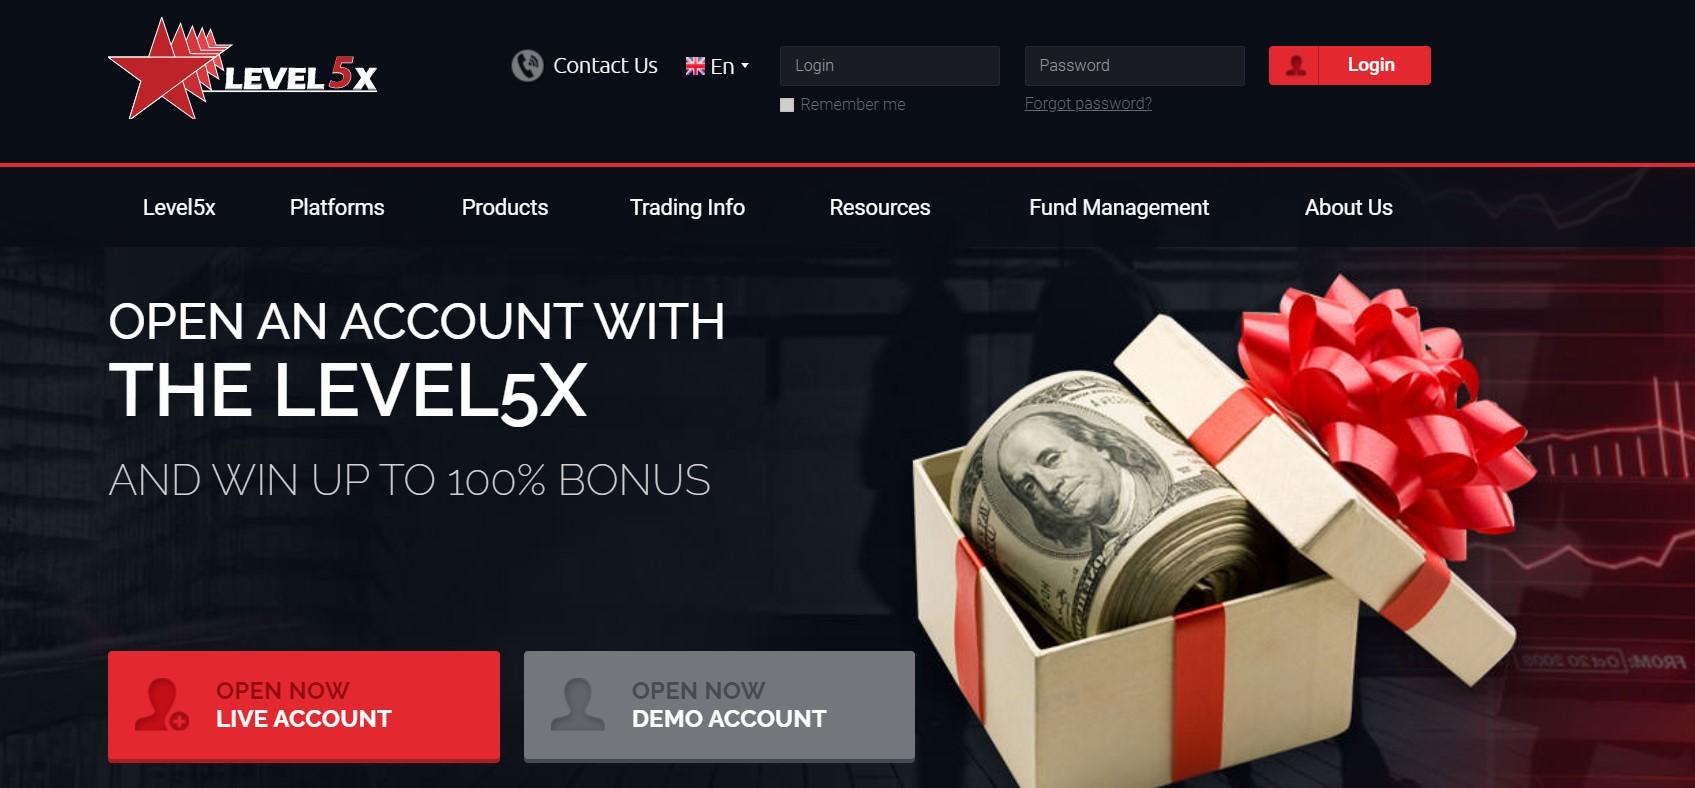 Level5x website